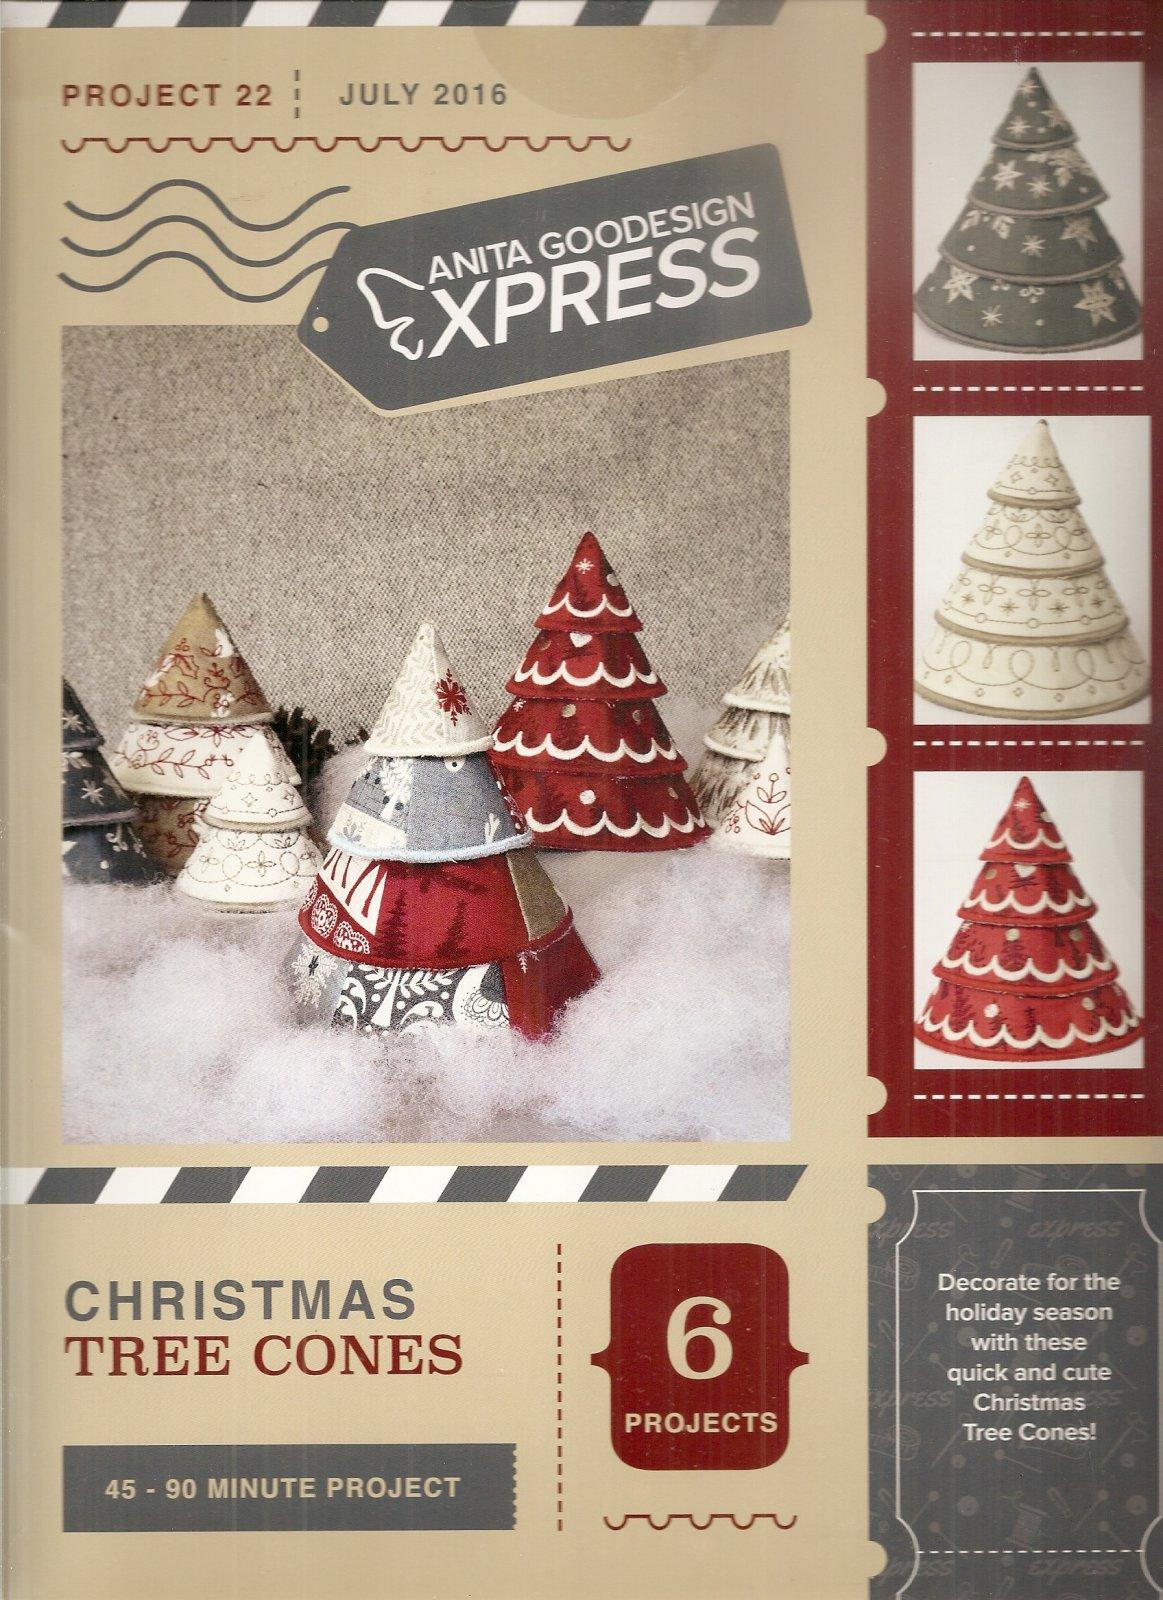 Anita goodesign express christmas tree cones